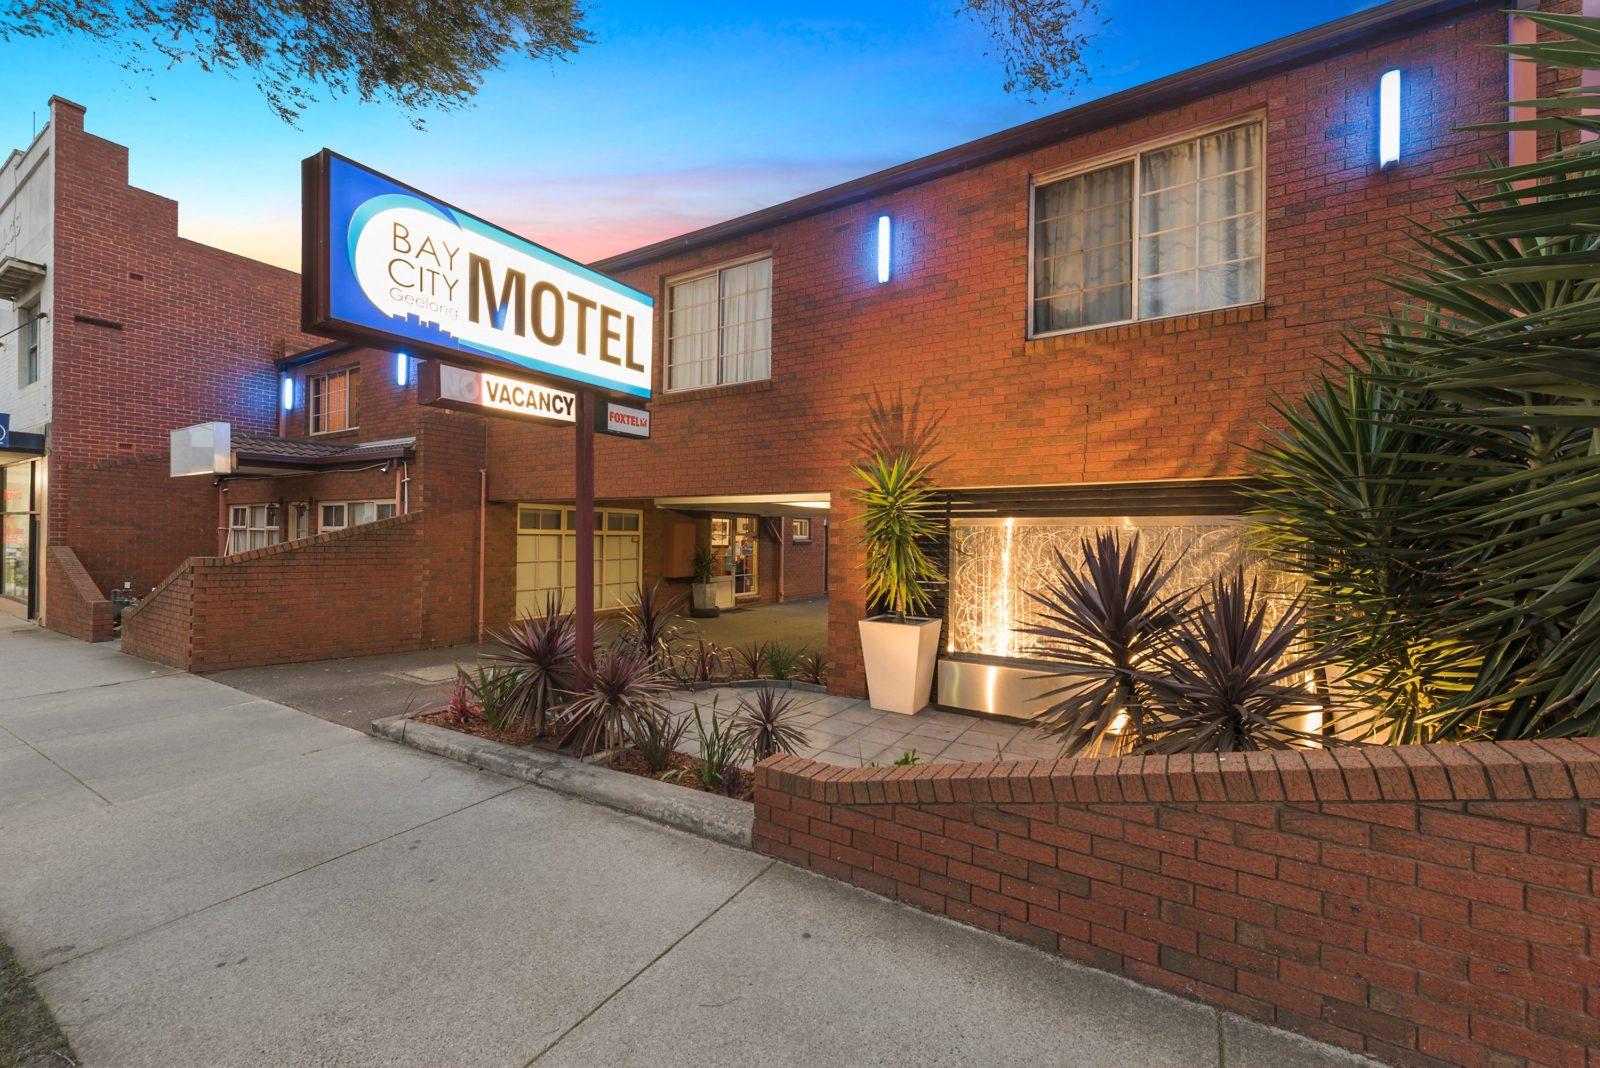 Entrance to Motel